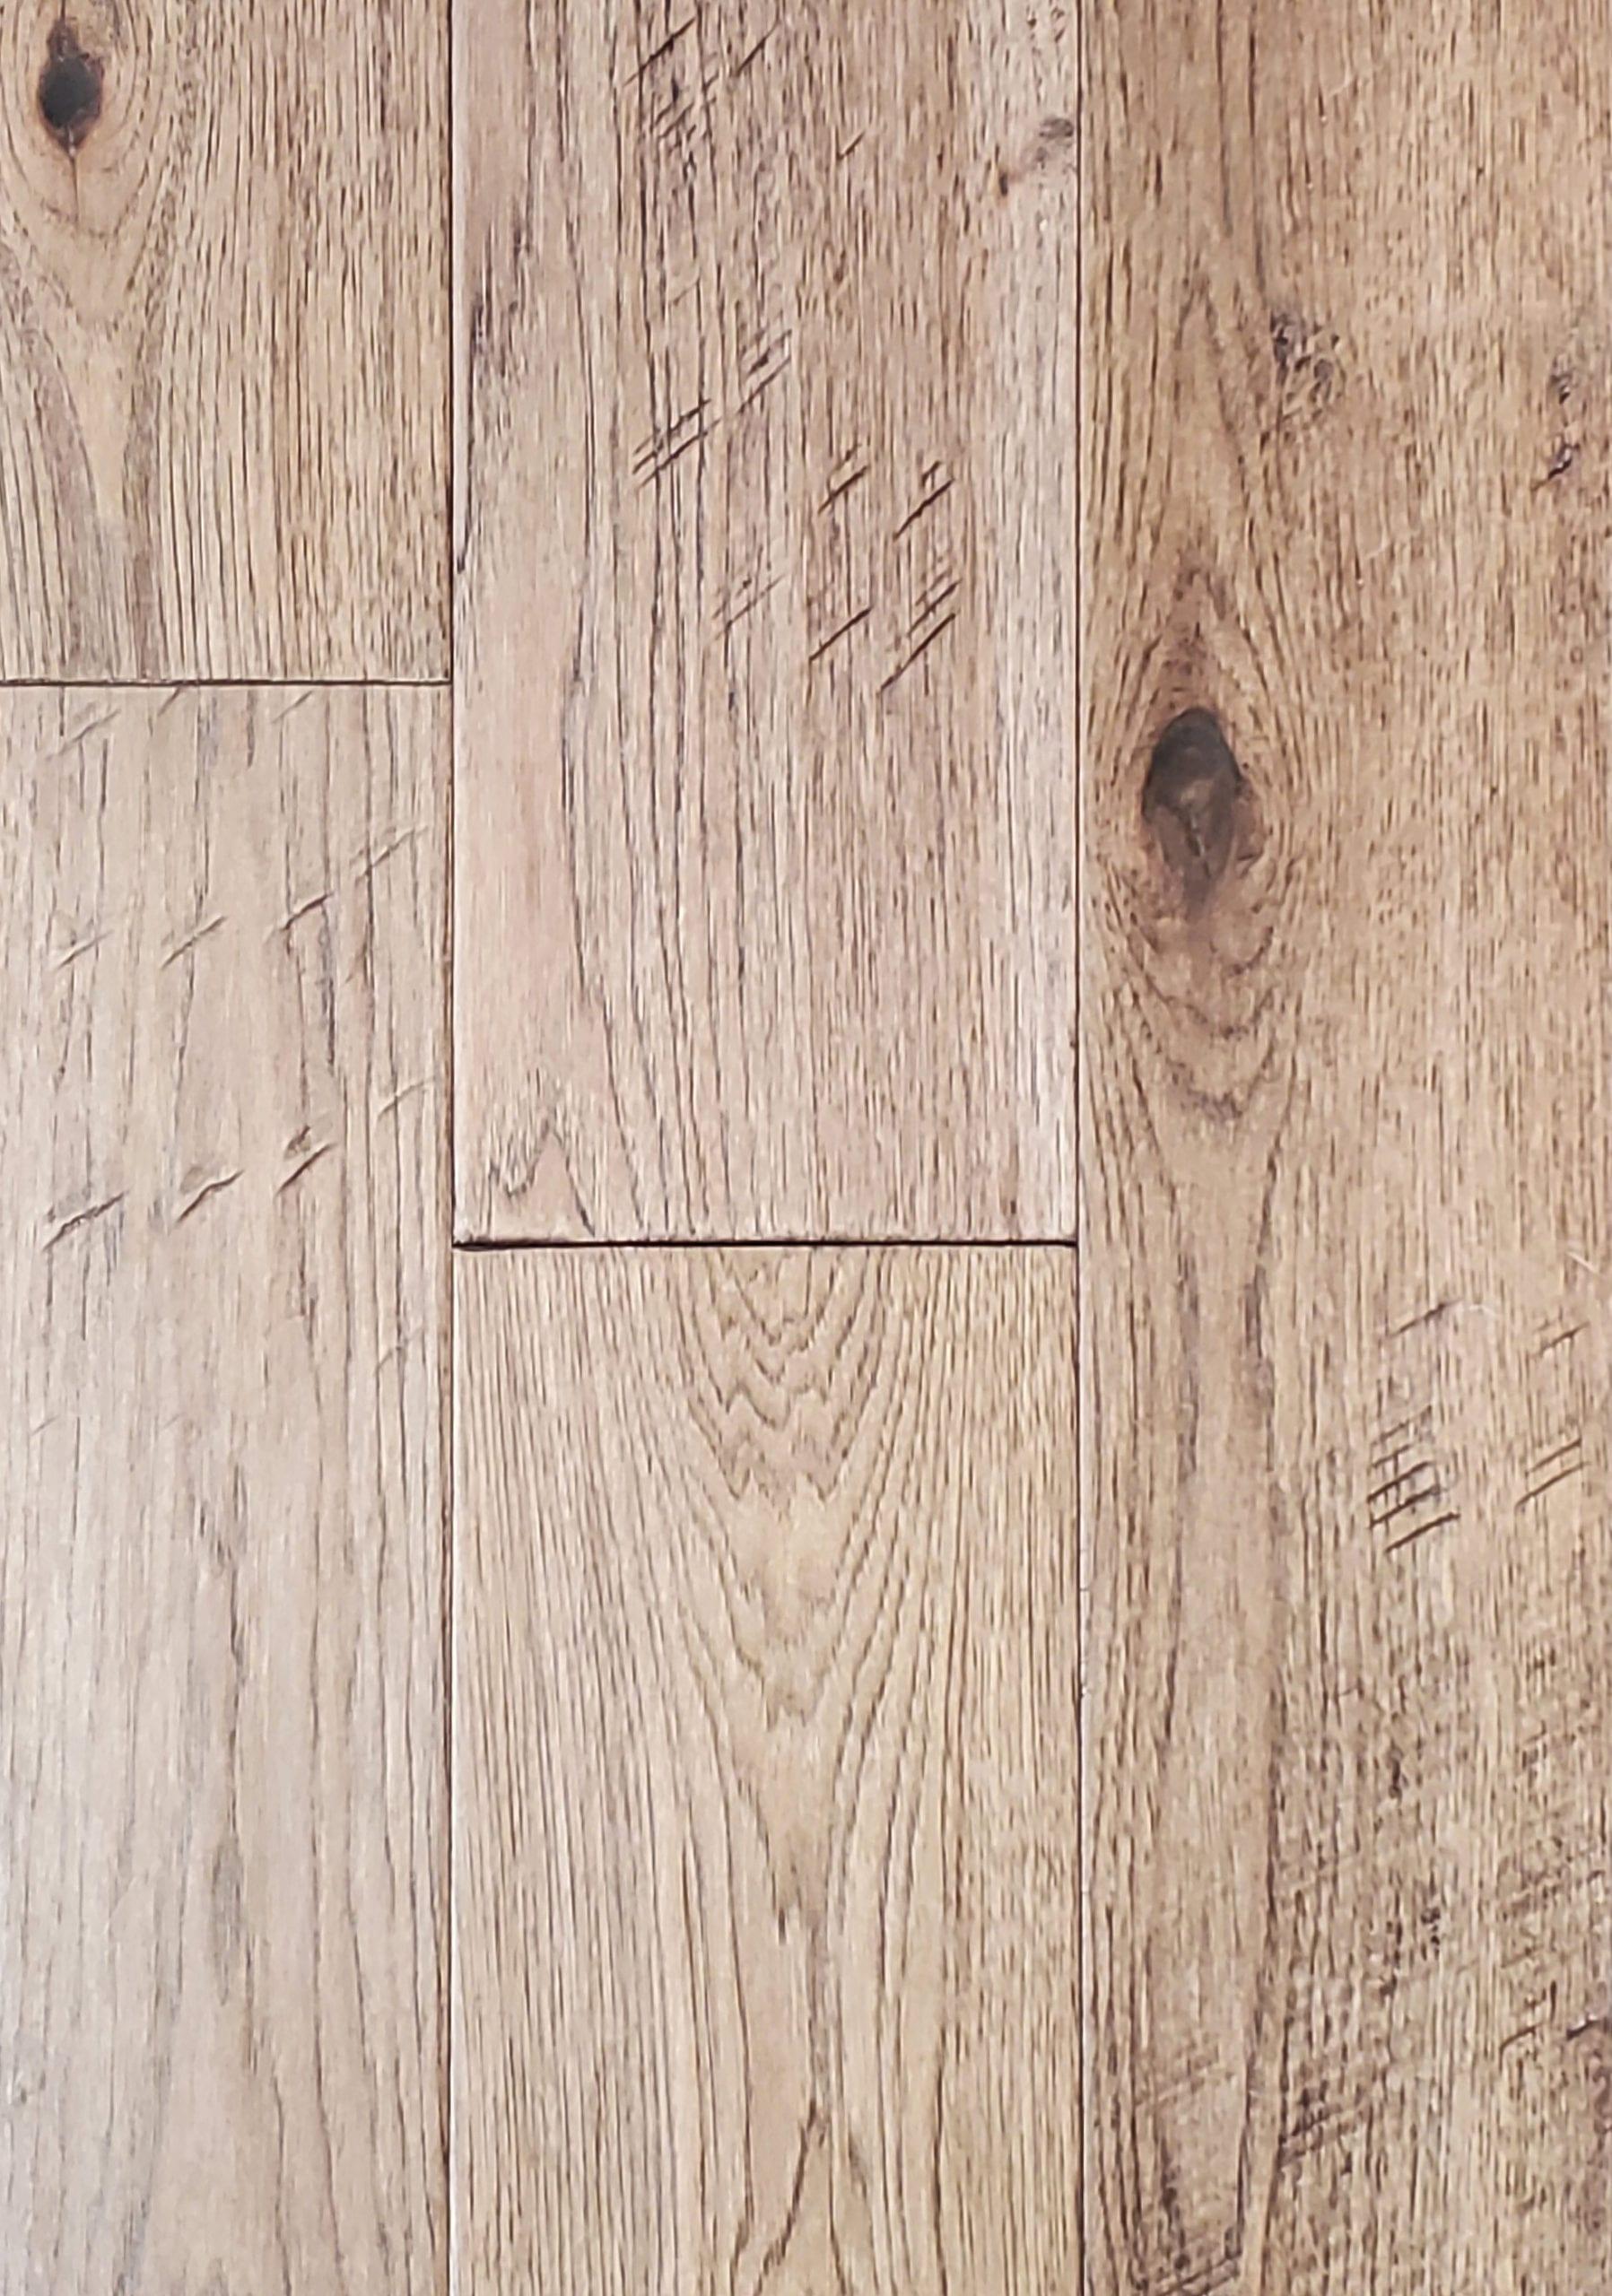 6.5inx.75inxRL Hickory Hardwood_Handscraped_Greystone_23.11sfct_4.99